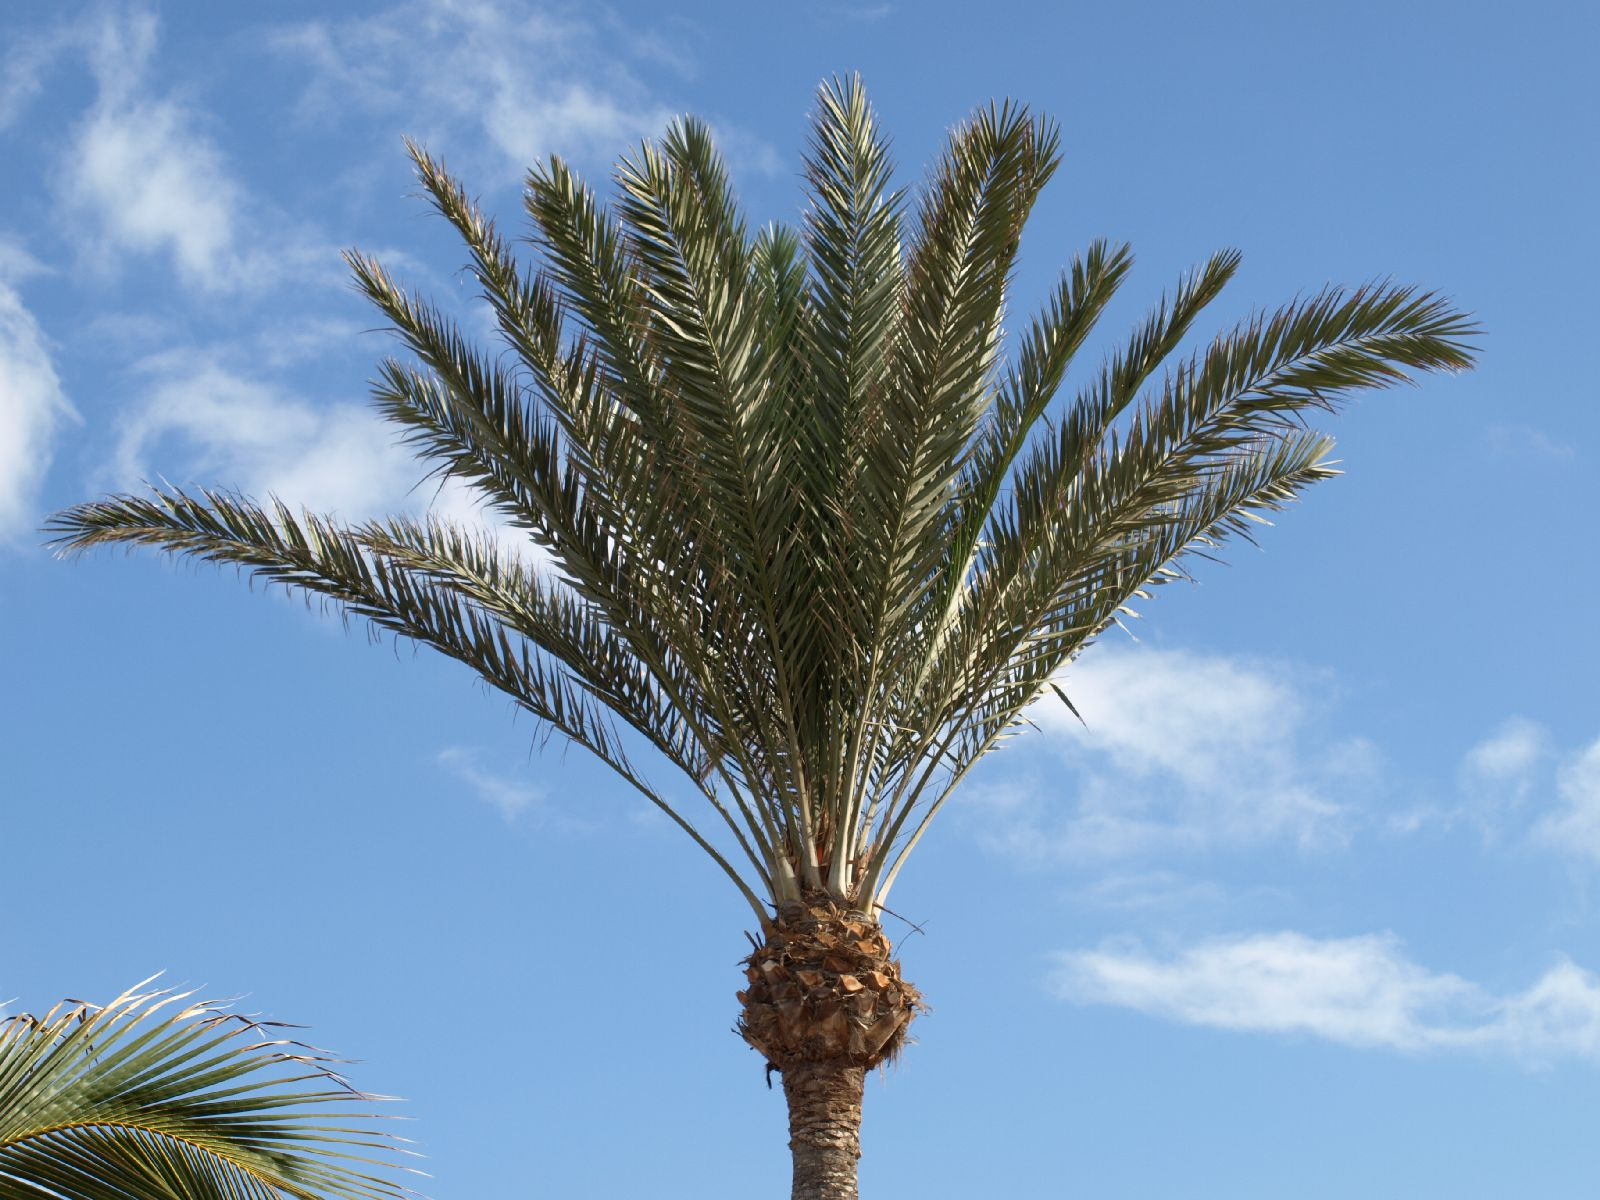 Pflanzen-Baum-Foto_Textur_B_P5265051